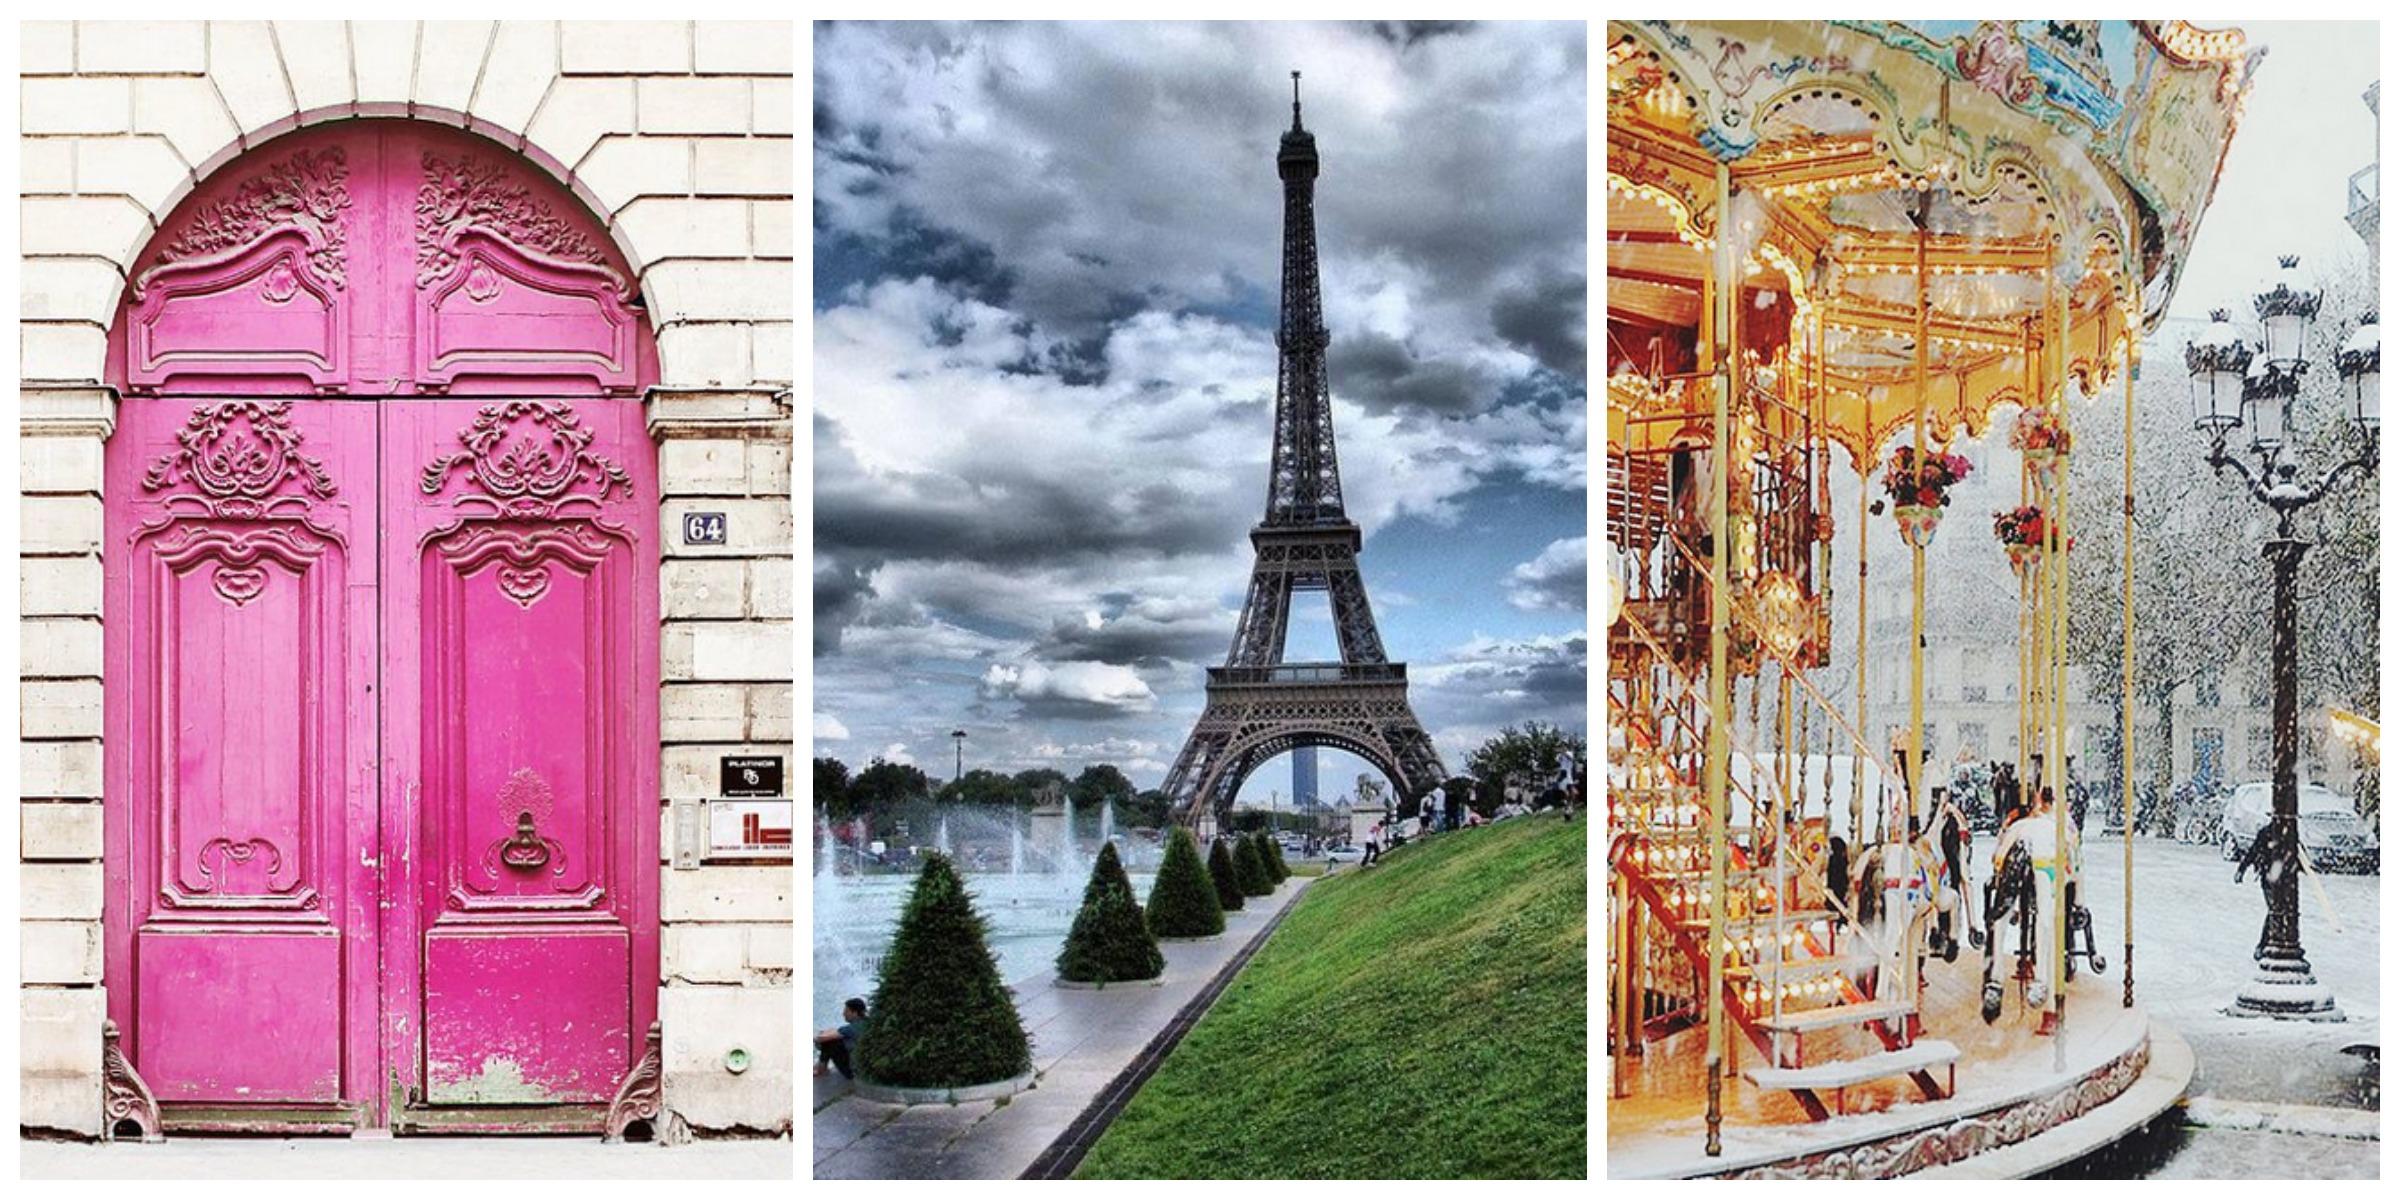 best wine bars in paris, best bars in paris, best places to eat in paris, paris travel guide, best restaurants in paris, paris bars, paris wine bars